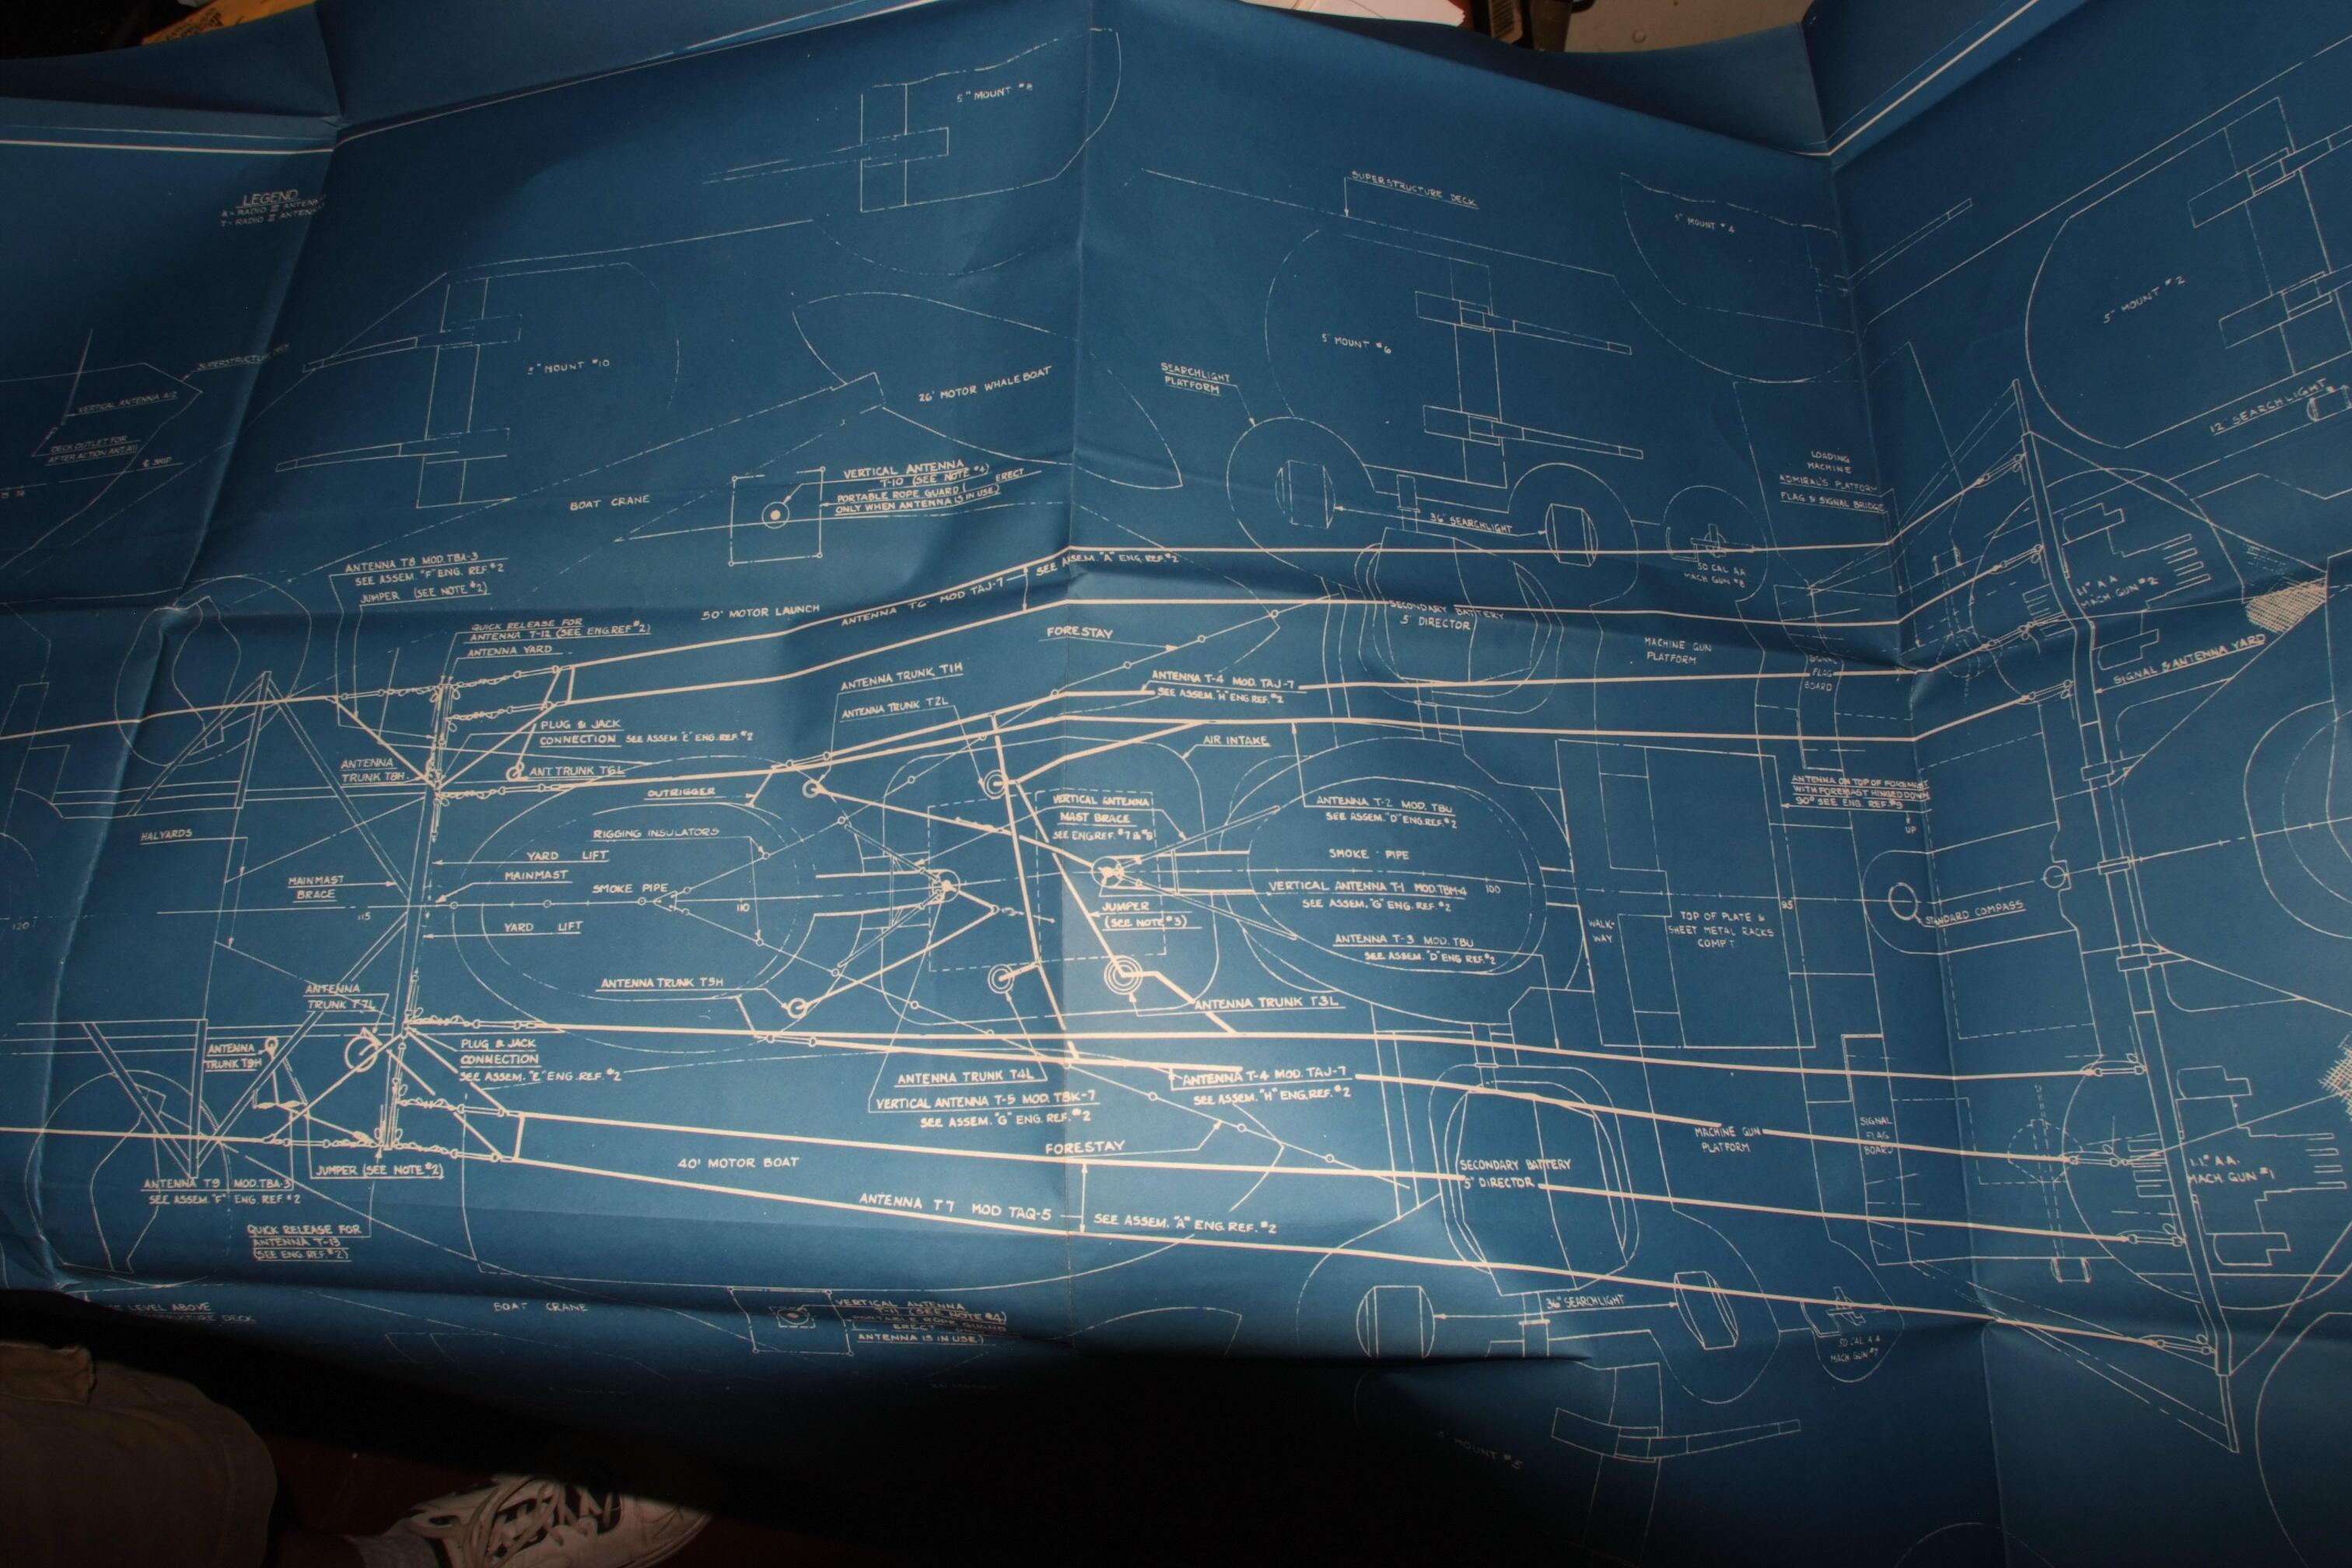 Uss north carolina bb 55 antennas 1041 blueprints malvernweather Image collections